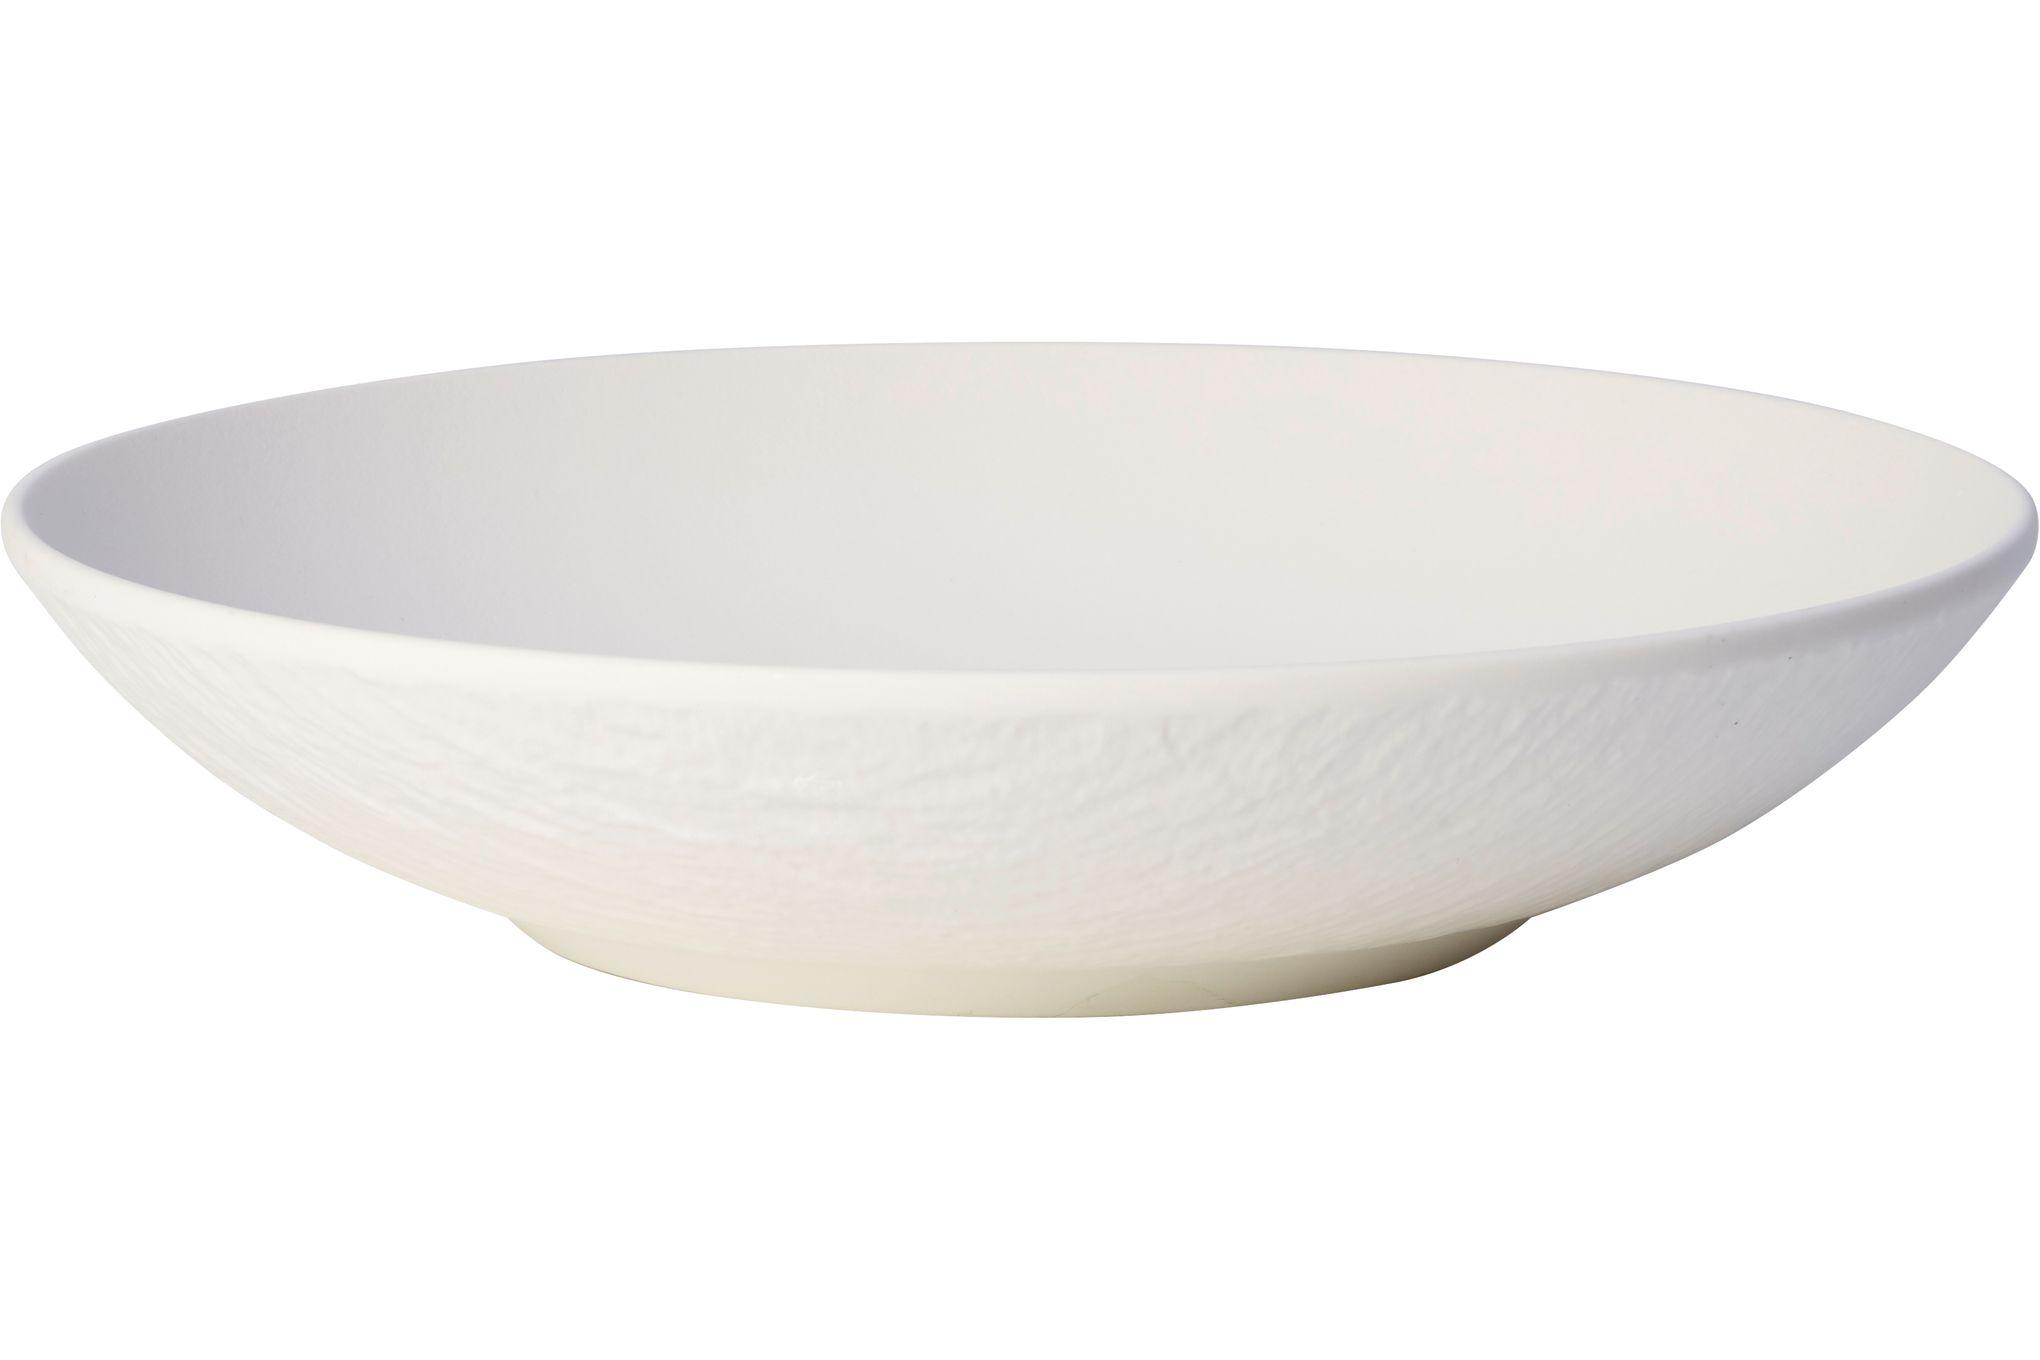 Villeroy & Boch Manufacture Rock Blanc Bowl 24cm thumb 1